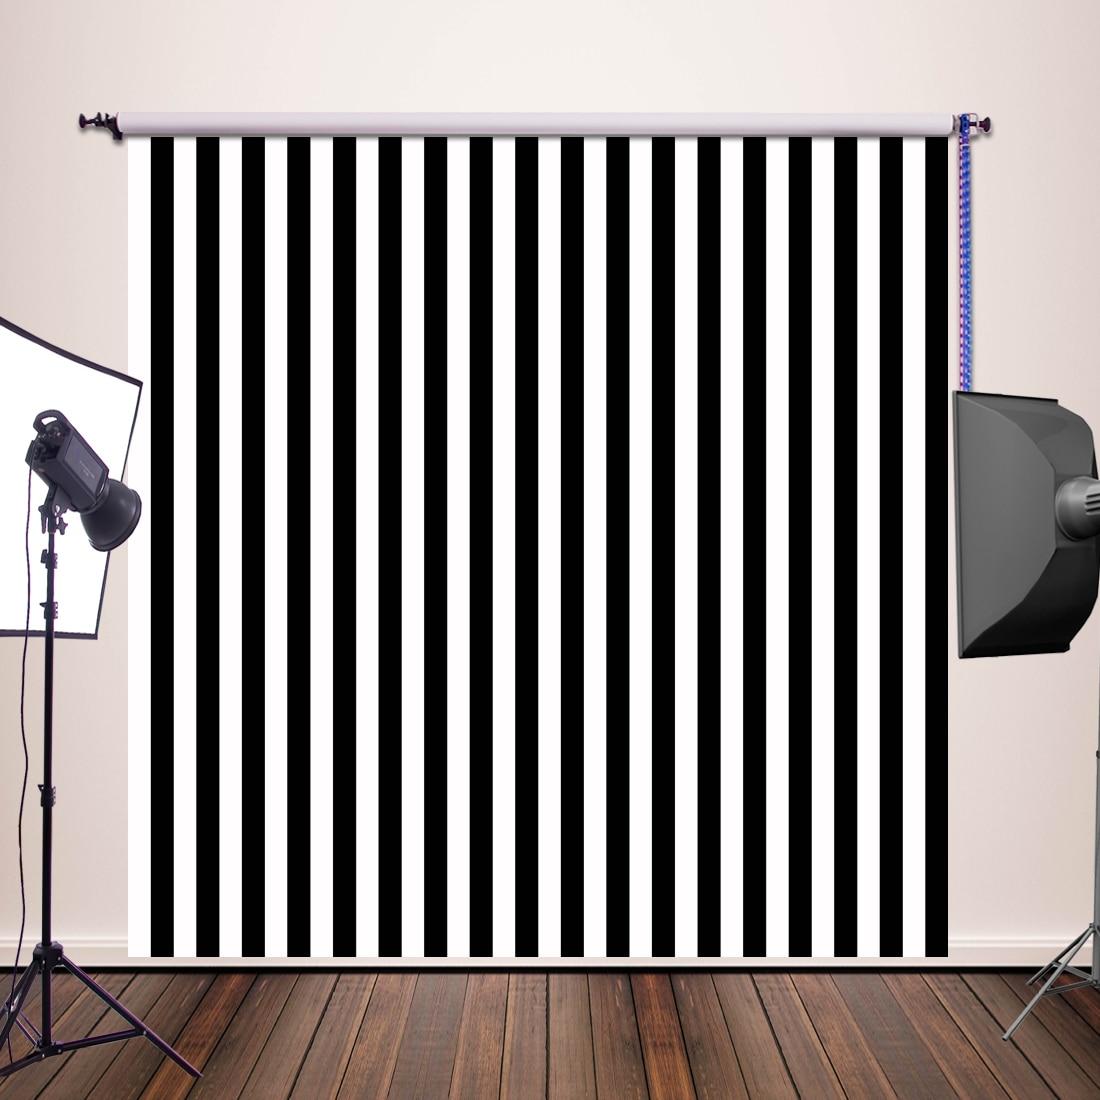 HUAYI 250x250cm Photography Background backdrop printed black and white stripes photo studio newborn backdrop XT 3595